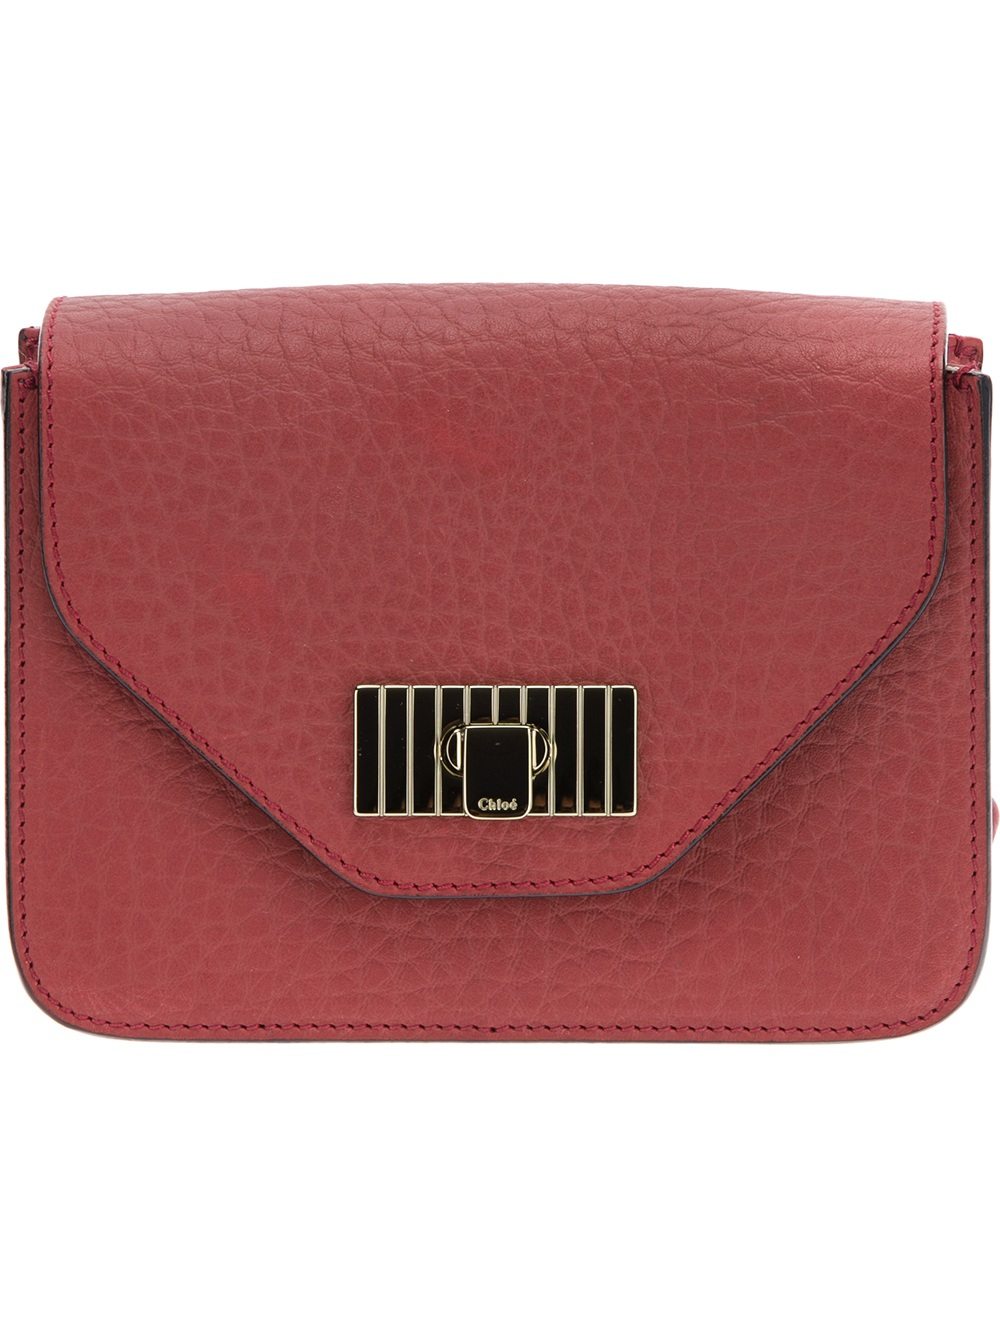 Chlo¨¦ Mini \u0026#39;Sally\u0026#39; Shoulder Bag in Red | Lyst